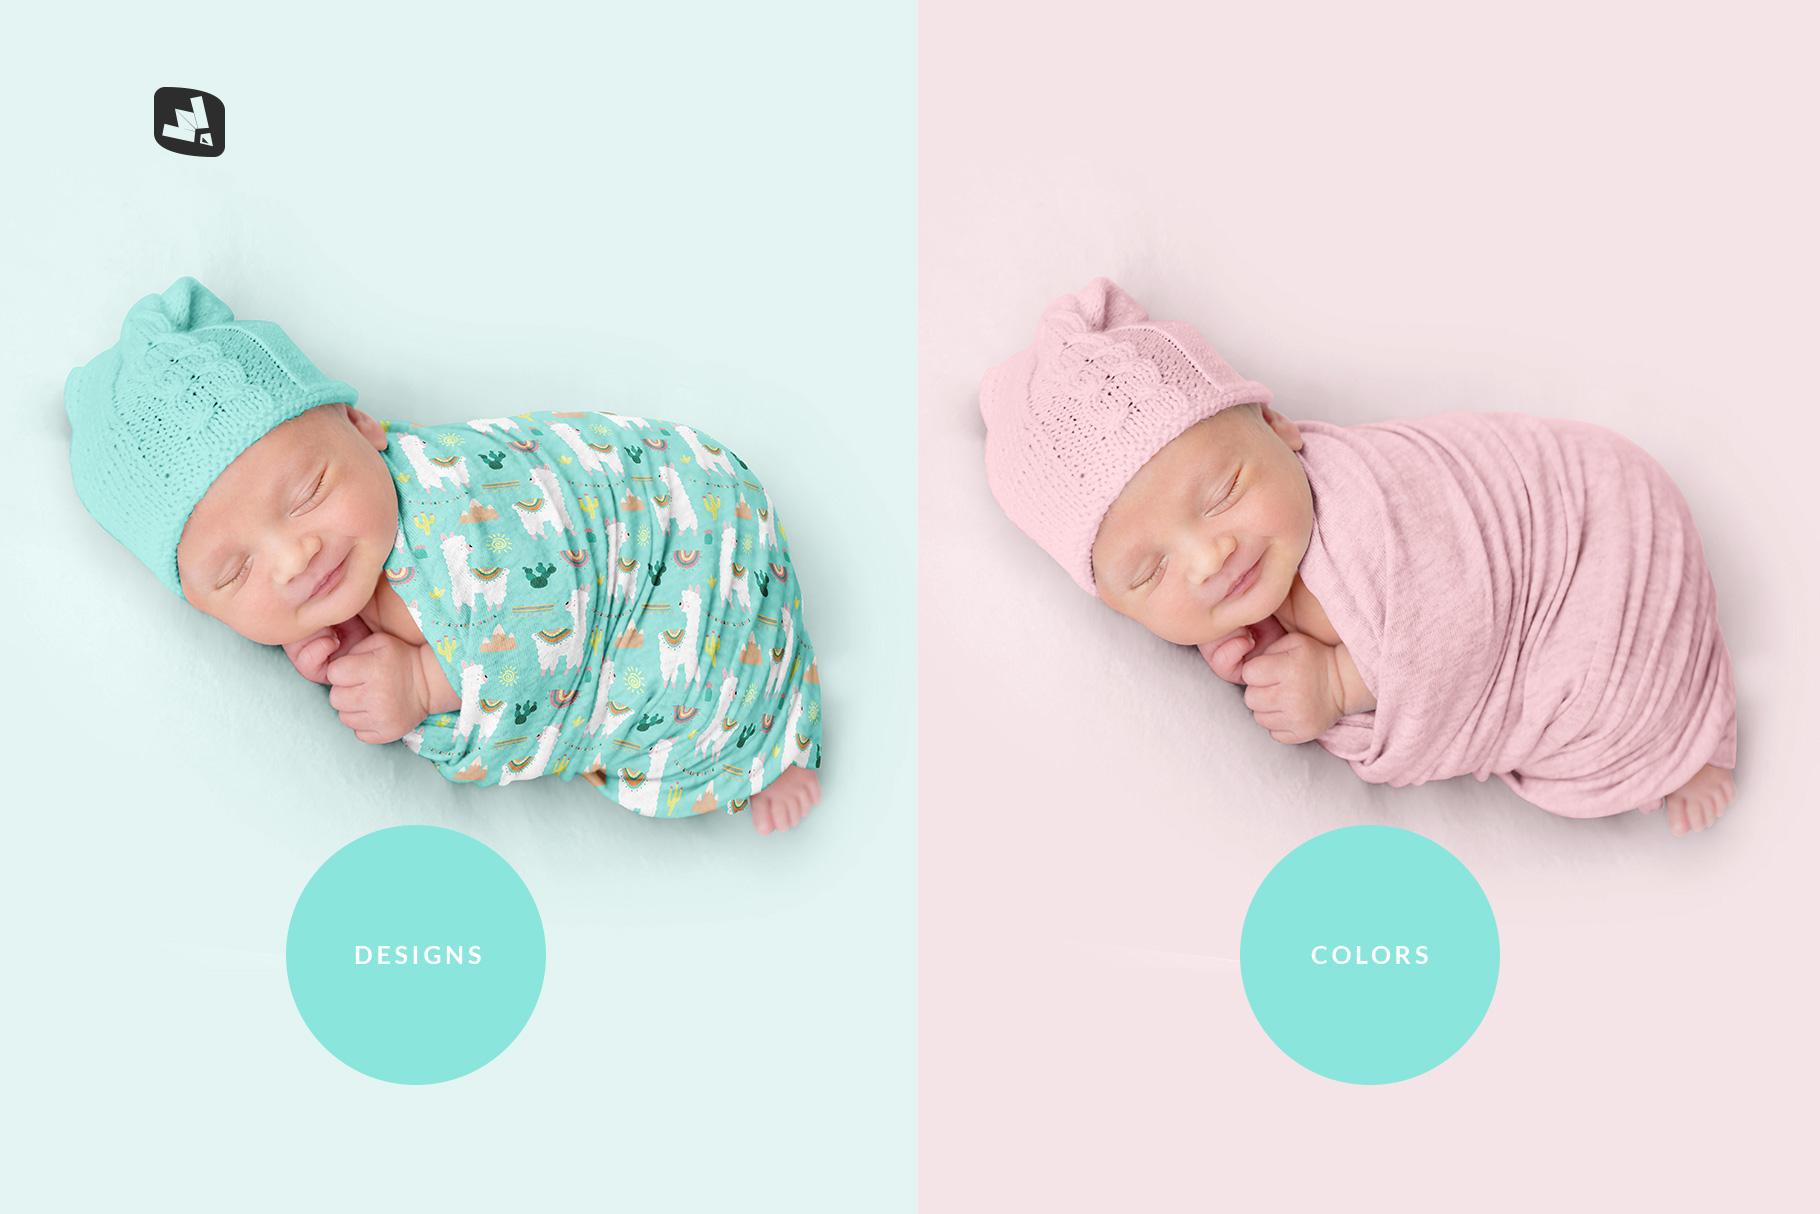 types of the newborn swaddle blanket mockup